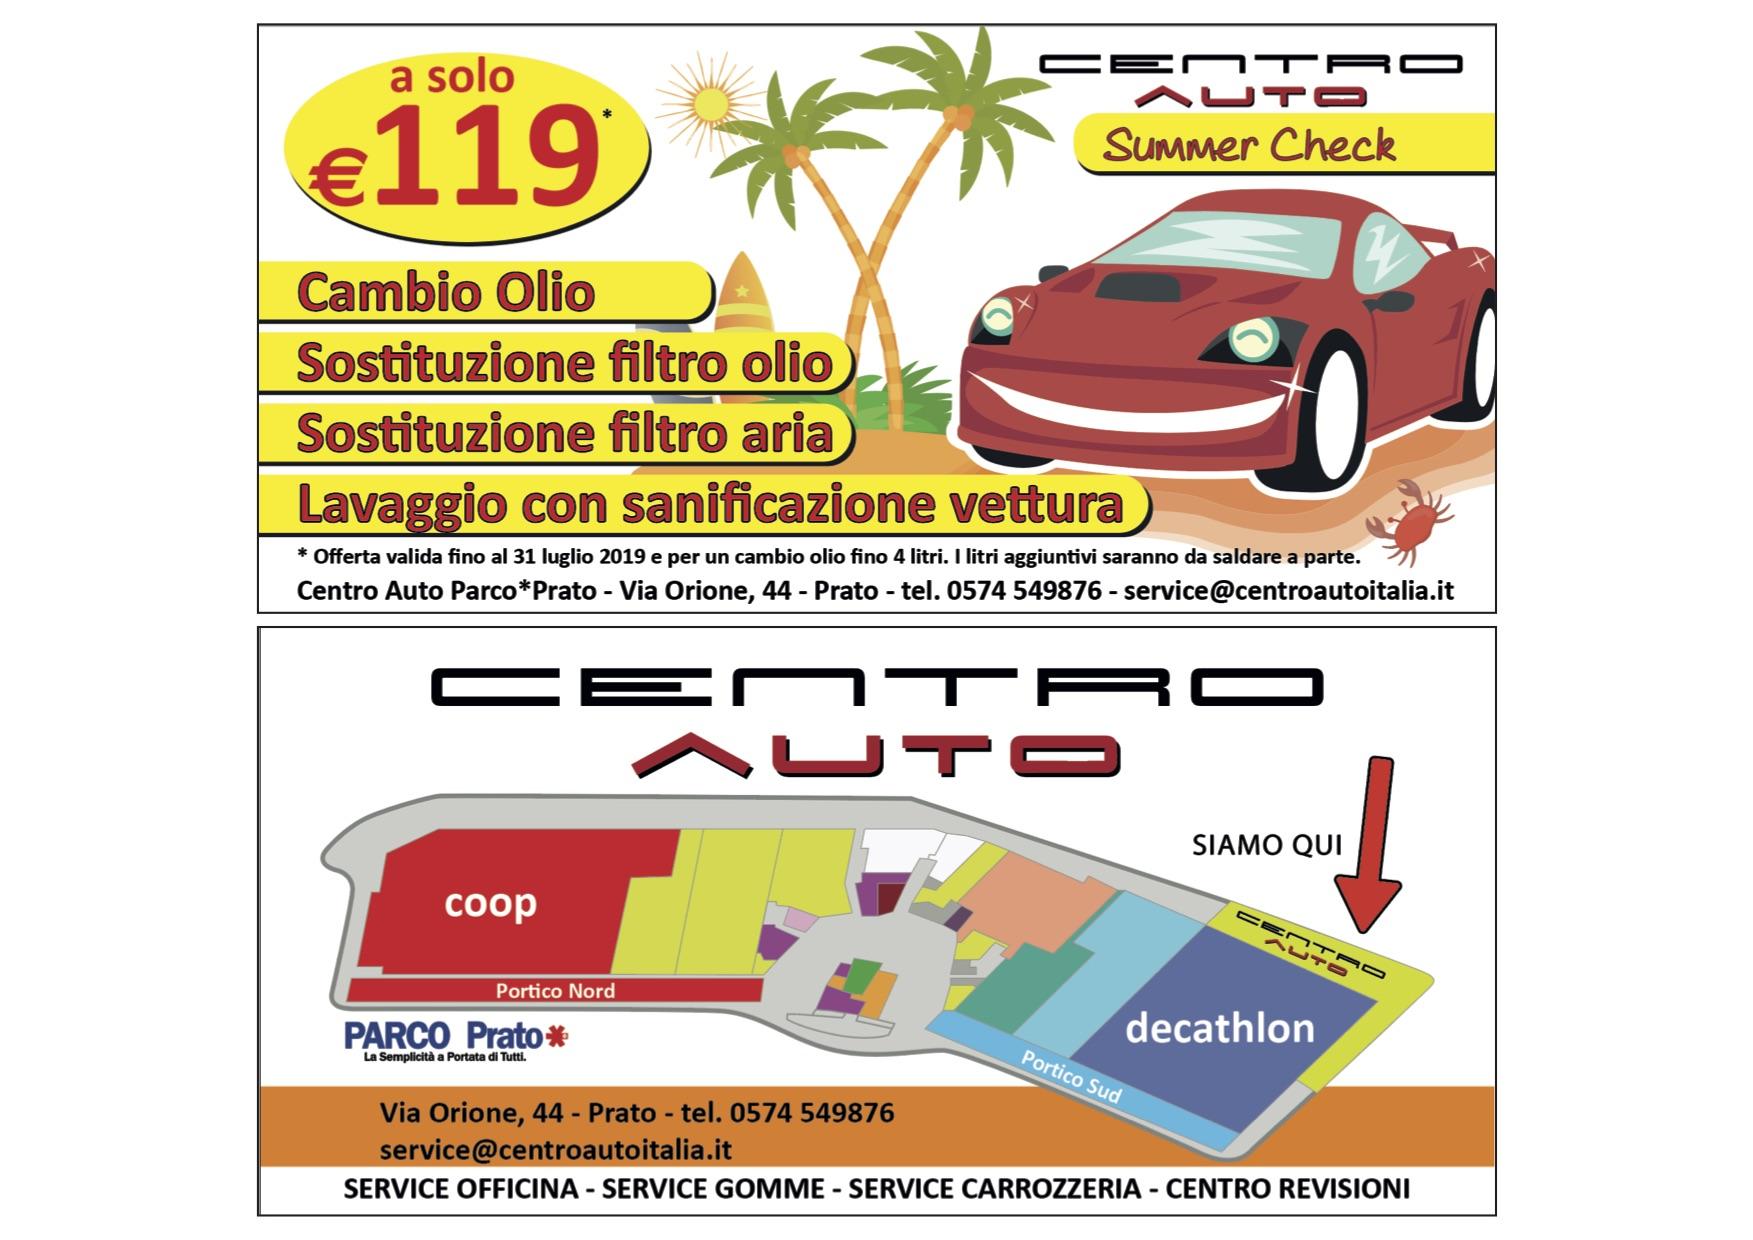 Parco Centro Commerciale Coop Coop Commerciale Centro Prato v7yIfgmb6Y